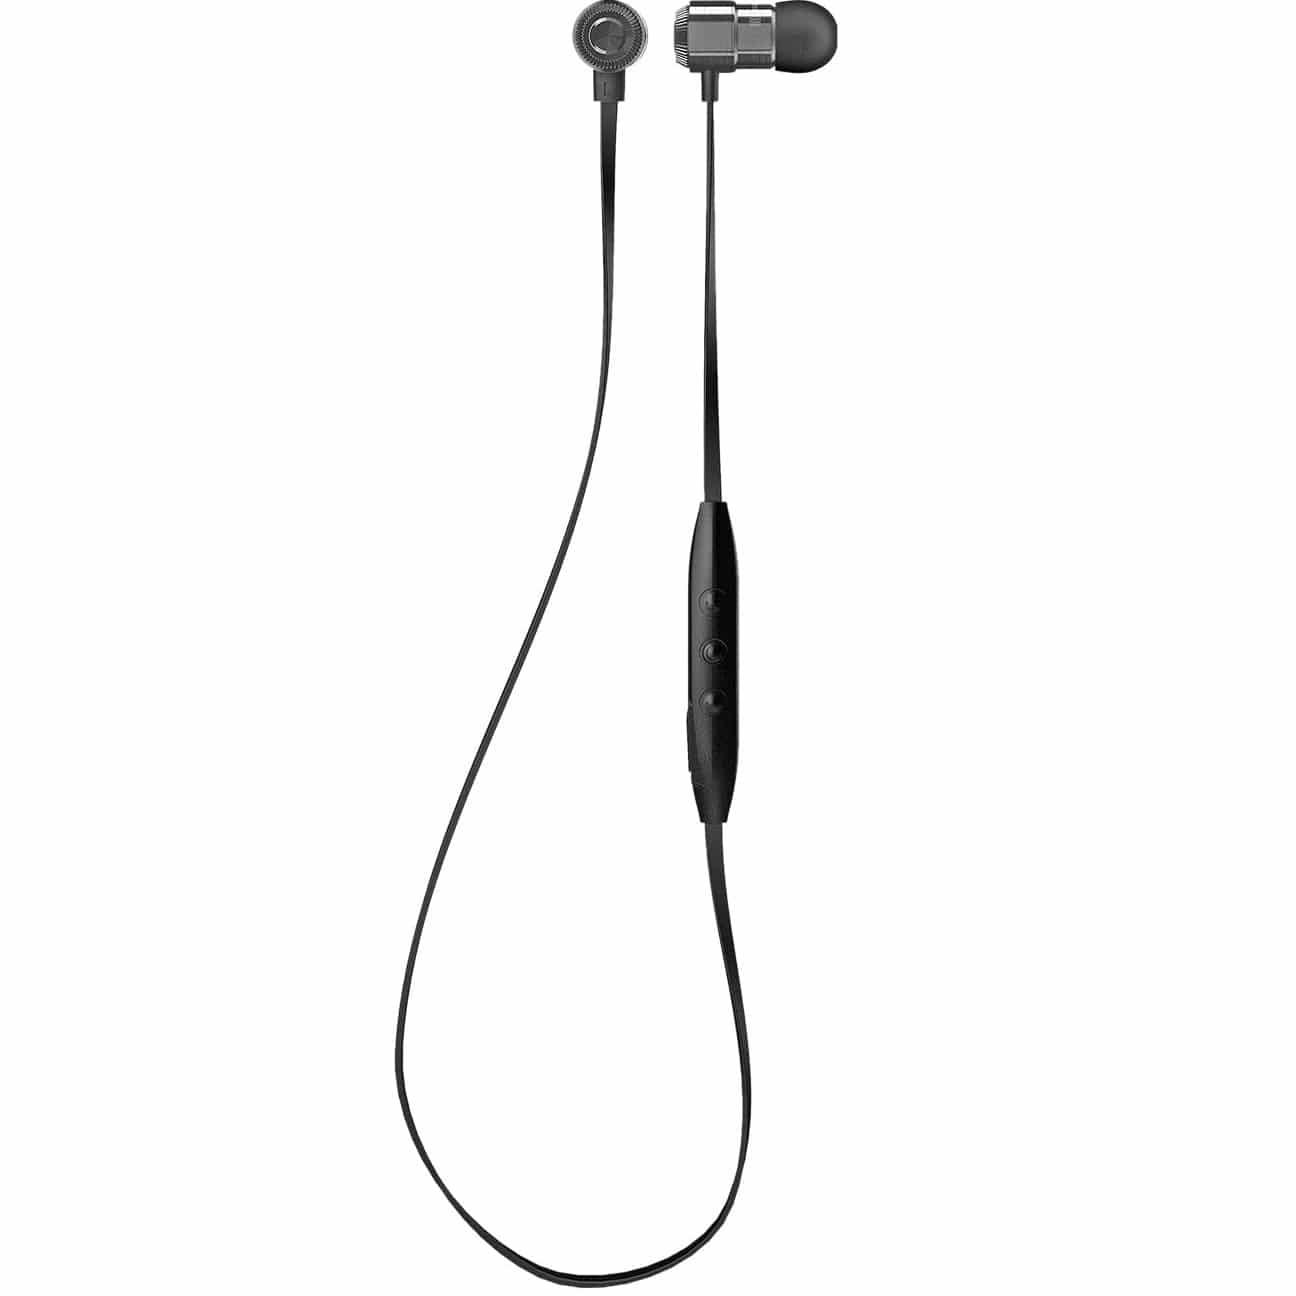 Beyerdynamic Byron BT Wireless Earbuds: A Complete Review